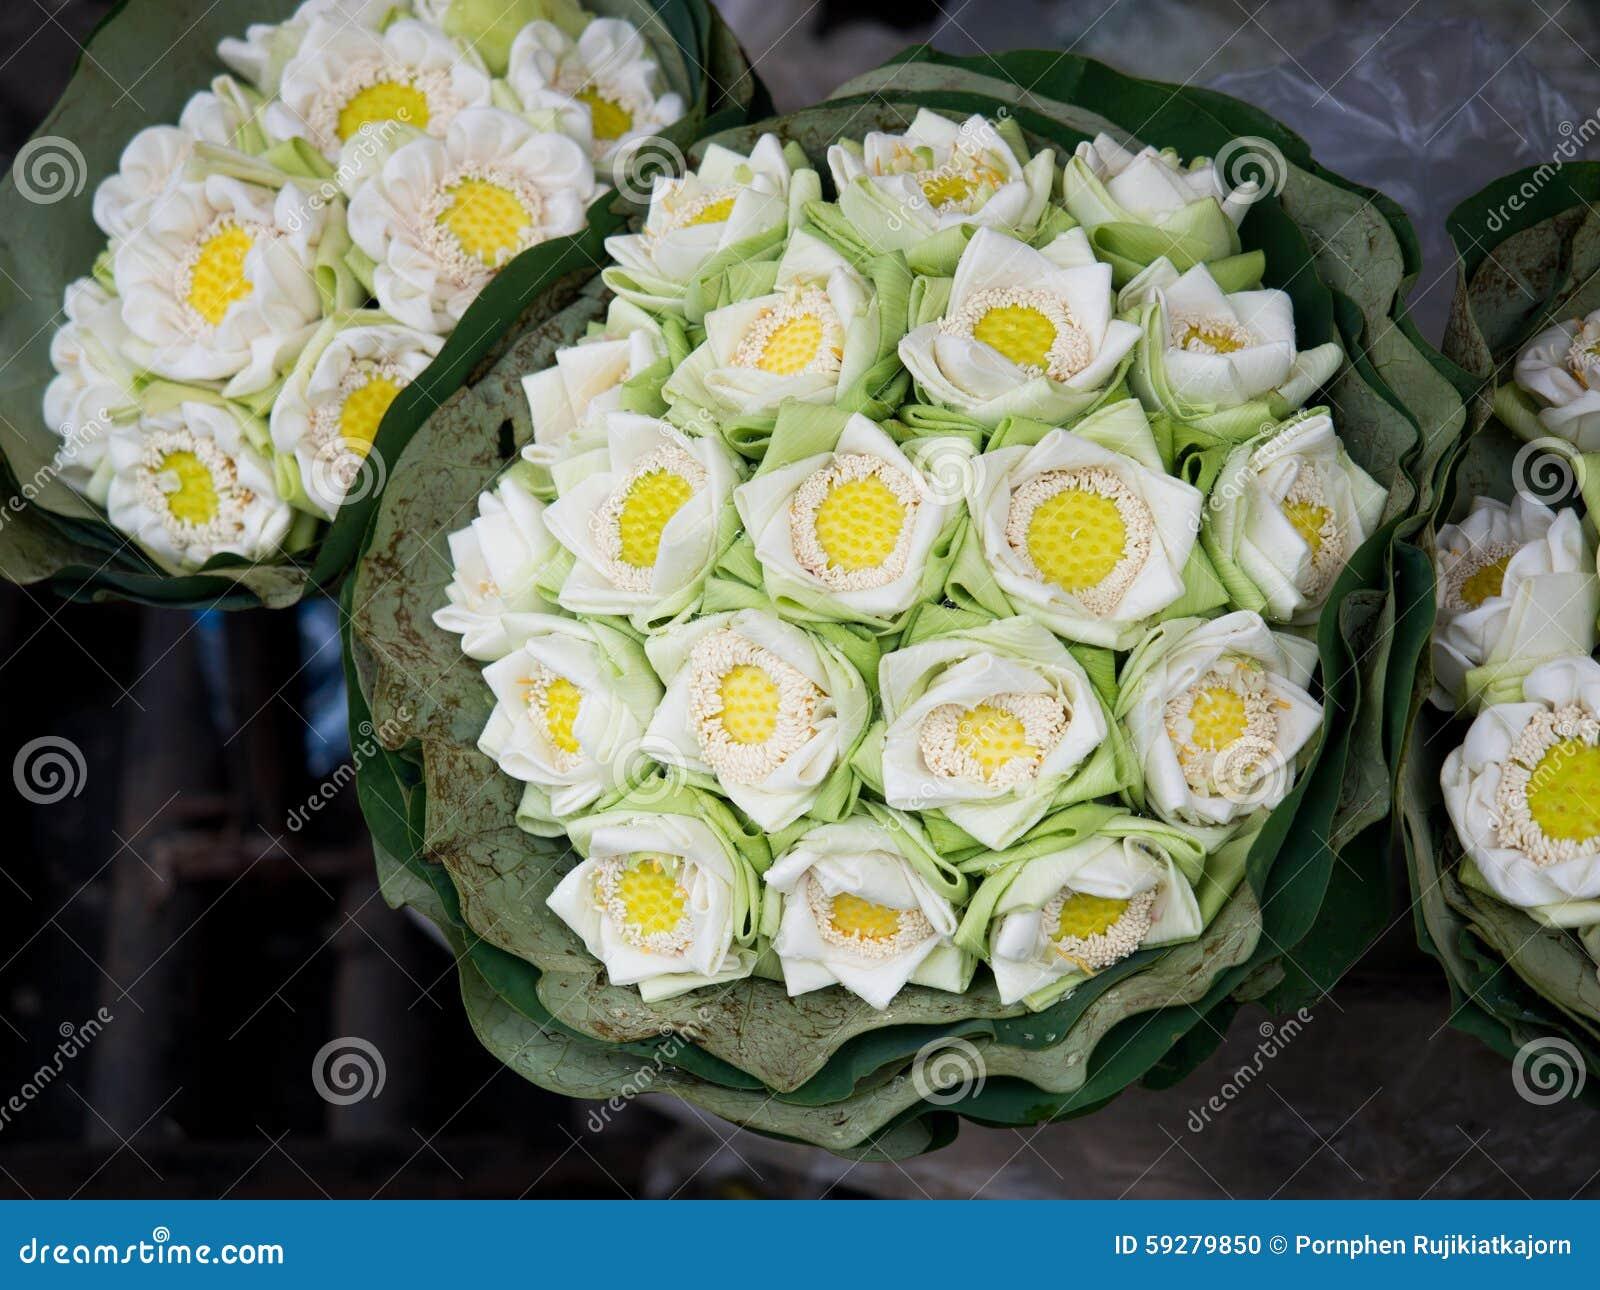 White lotus flower stock photo image of market flower 59279850 white lotus flower izmirmasajfo Image collections